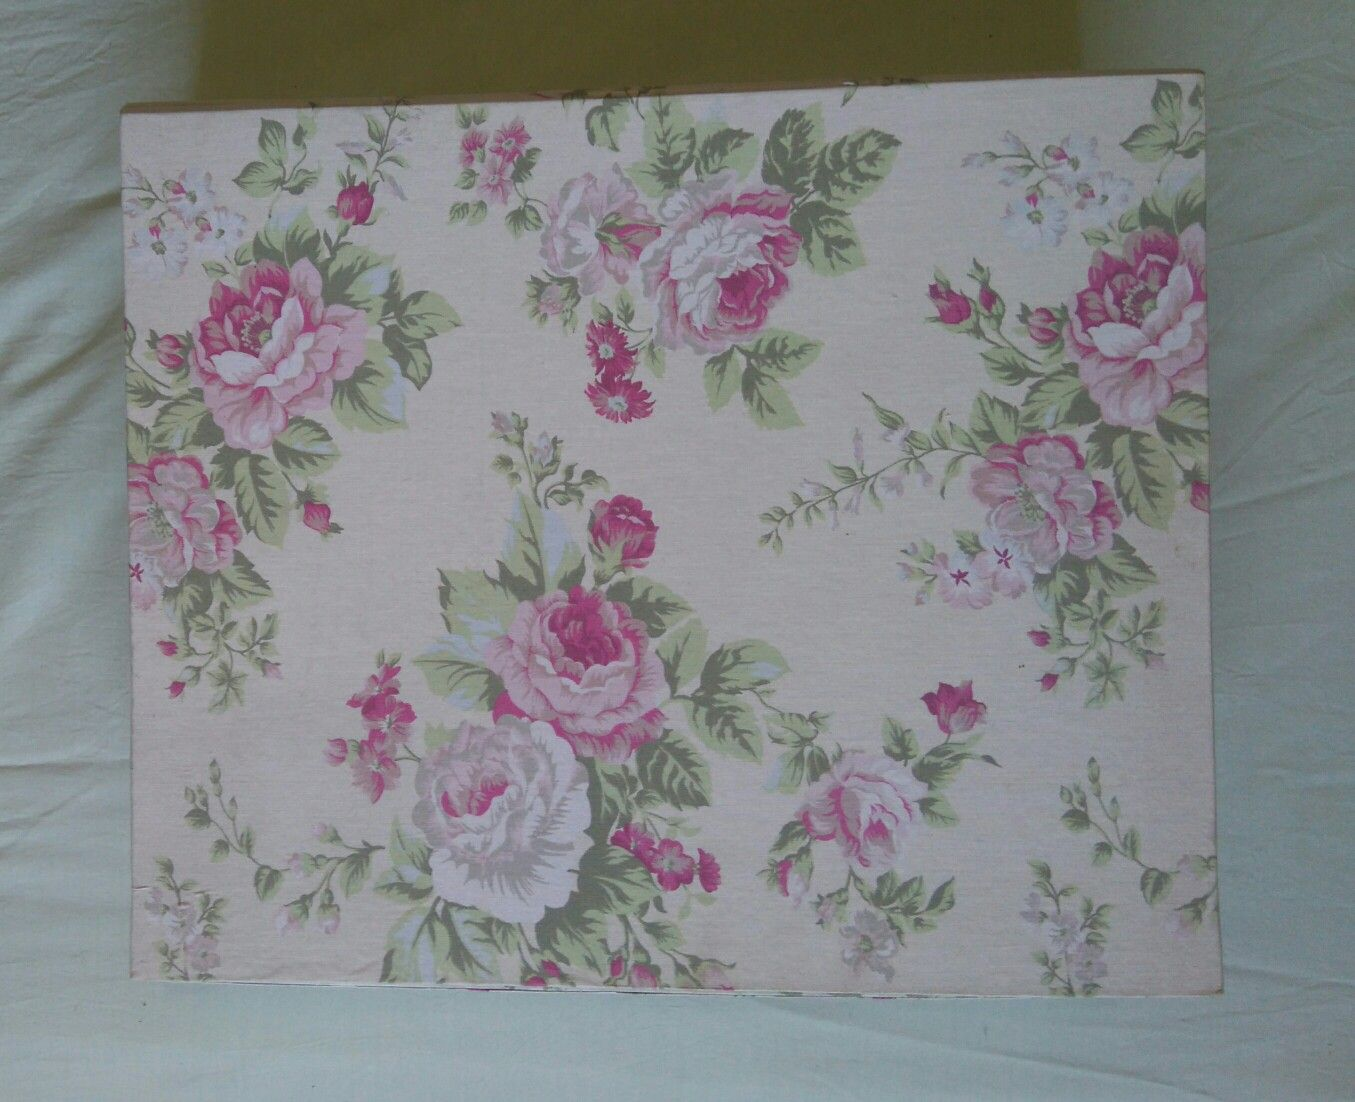 Caixa de Costura Floral  Cartonagem